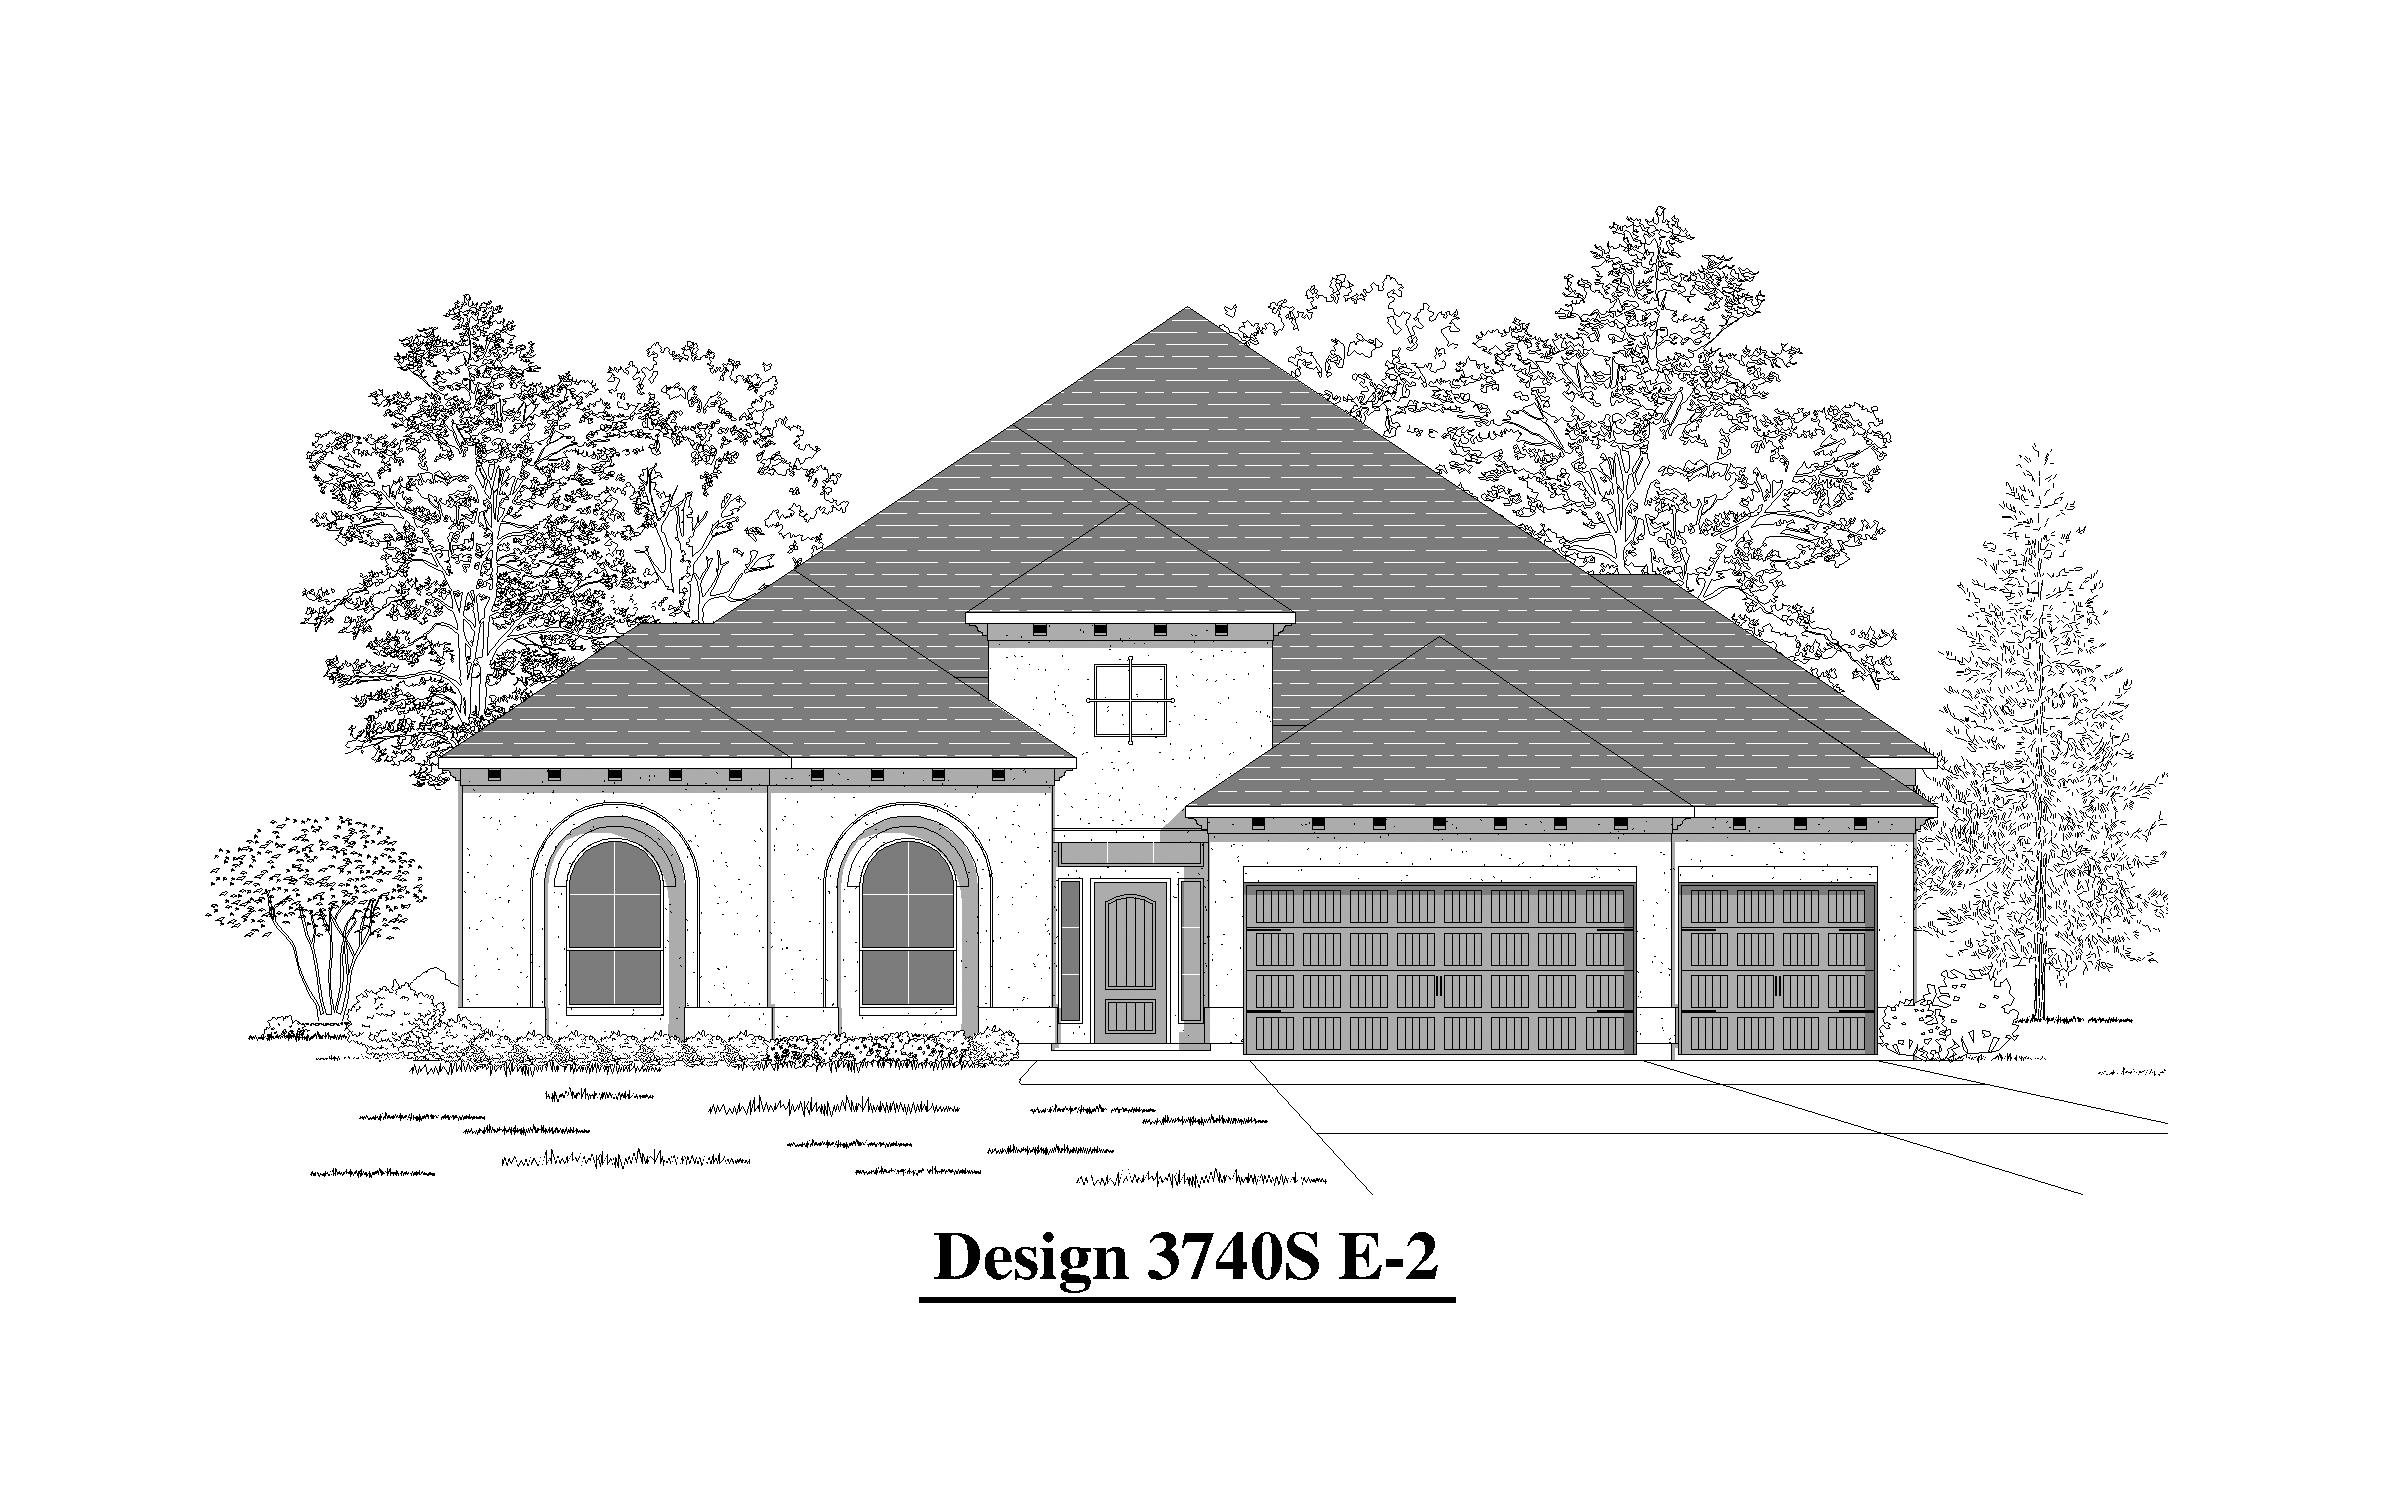 Single Family for Sale at Balcones Creek Half Acre - 3740s 7986 Cibolo View Fair Oaks Ranch, Texas 78015 United States